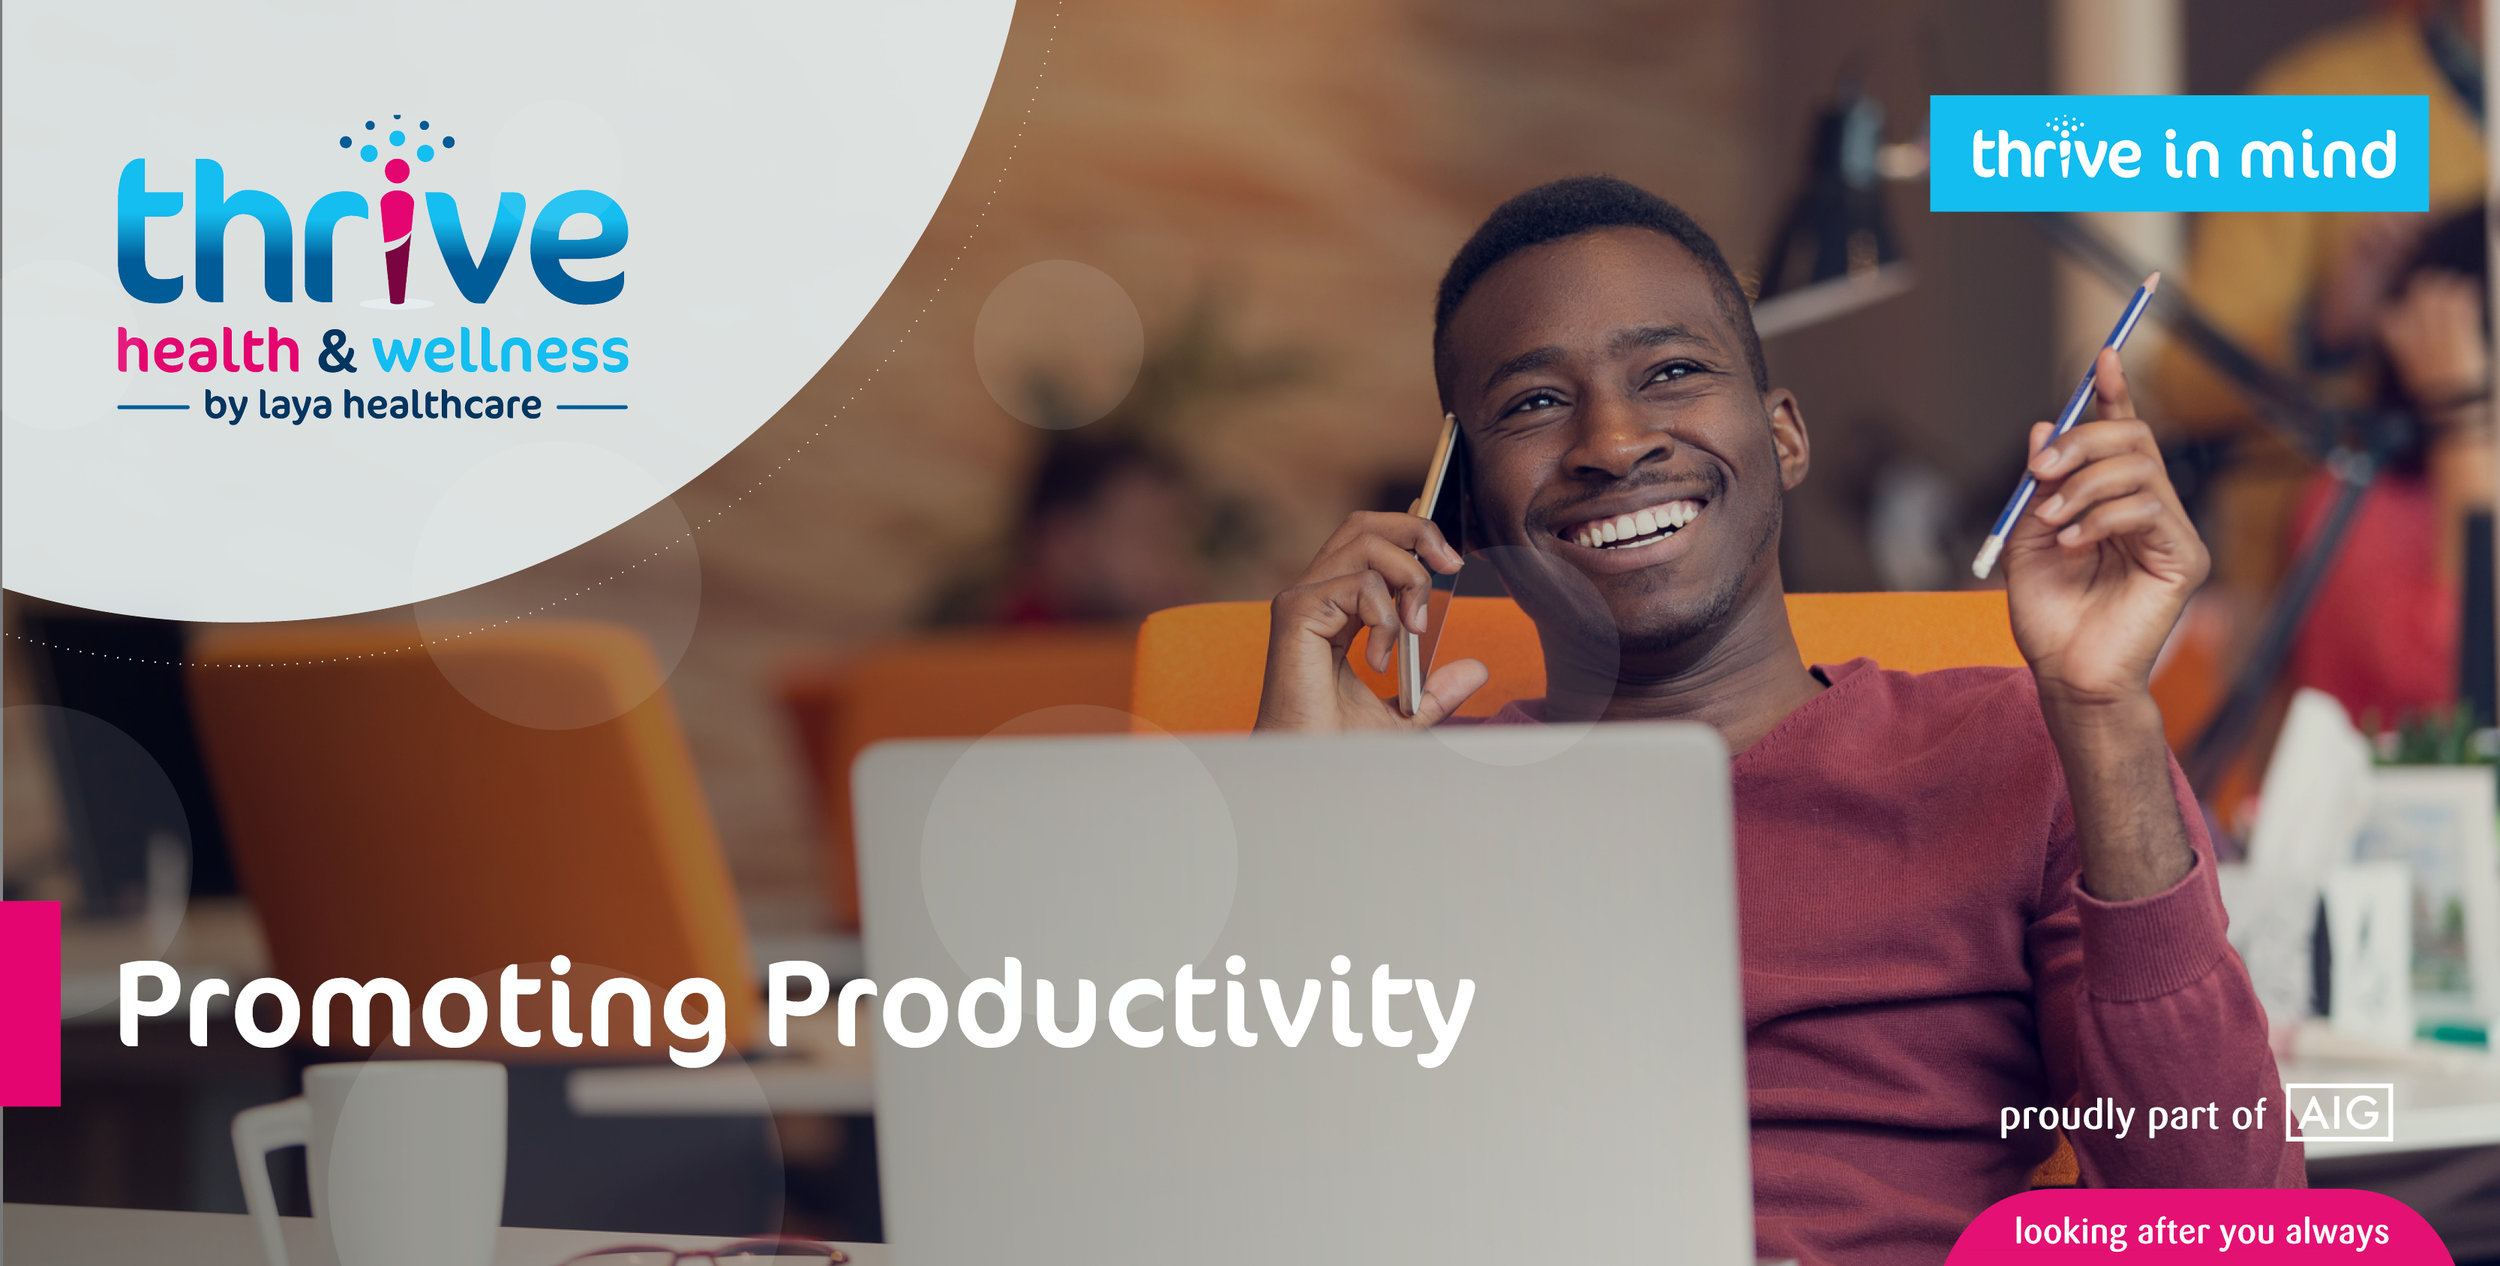 MAILCHIMP TEMPLATE. Promoting Productivity.jpg